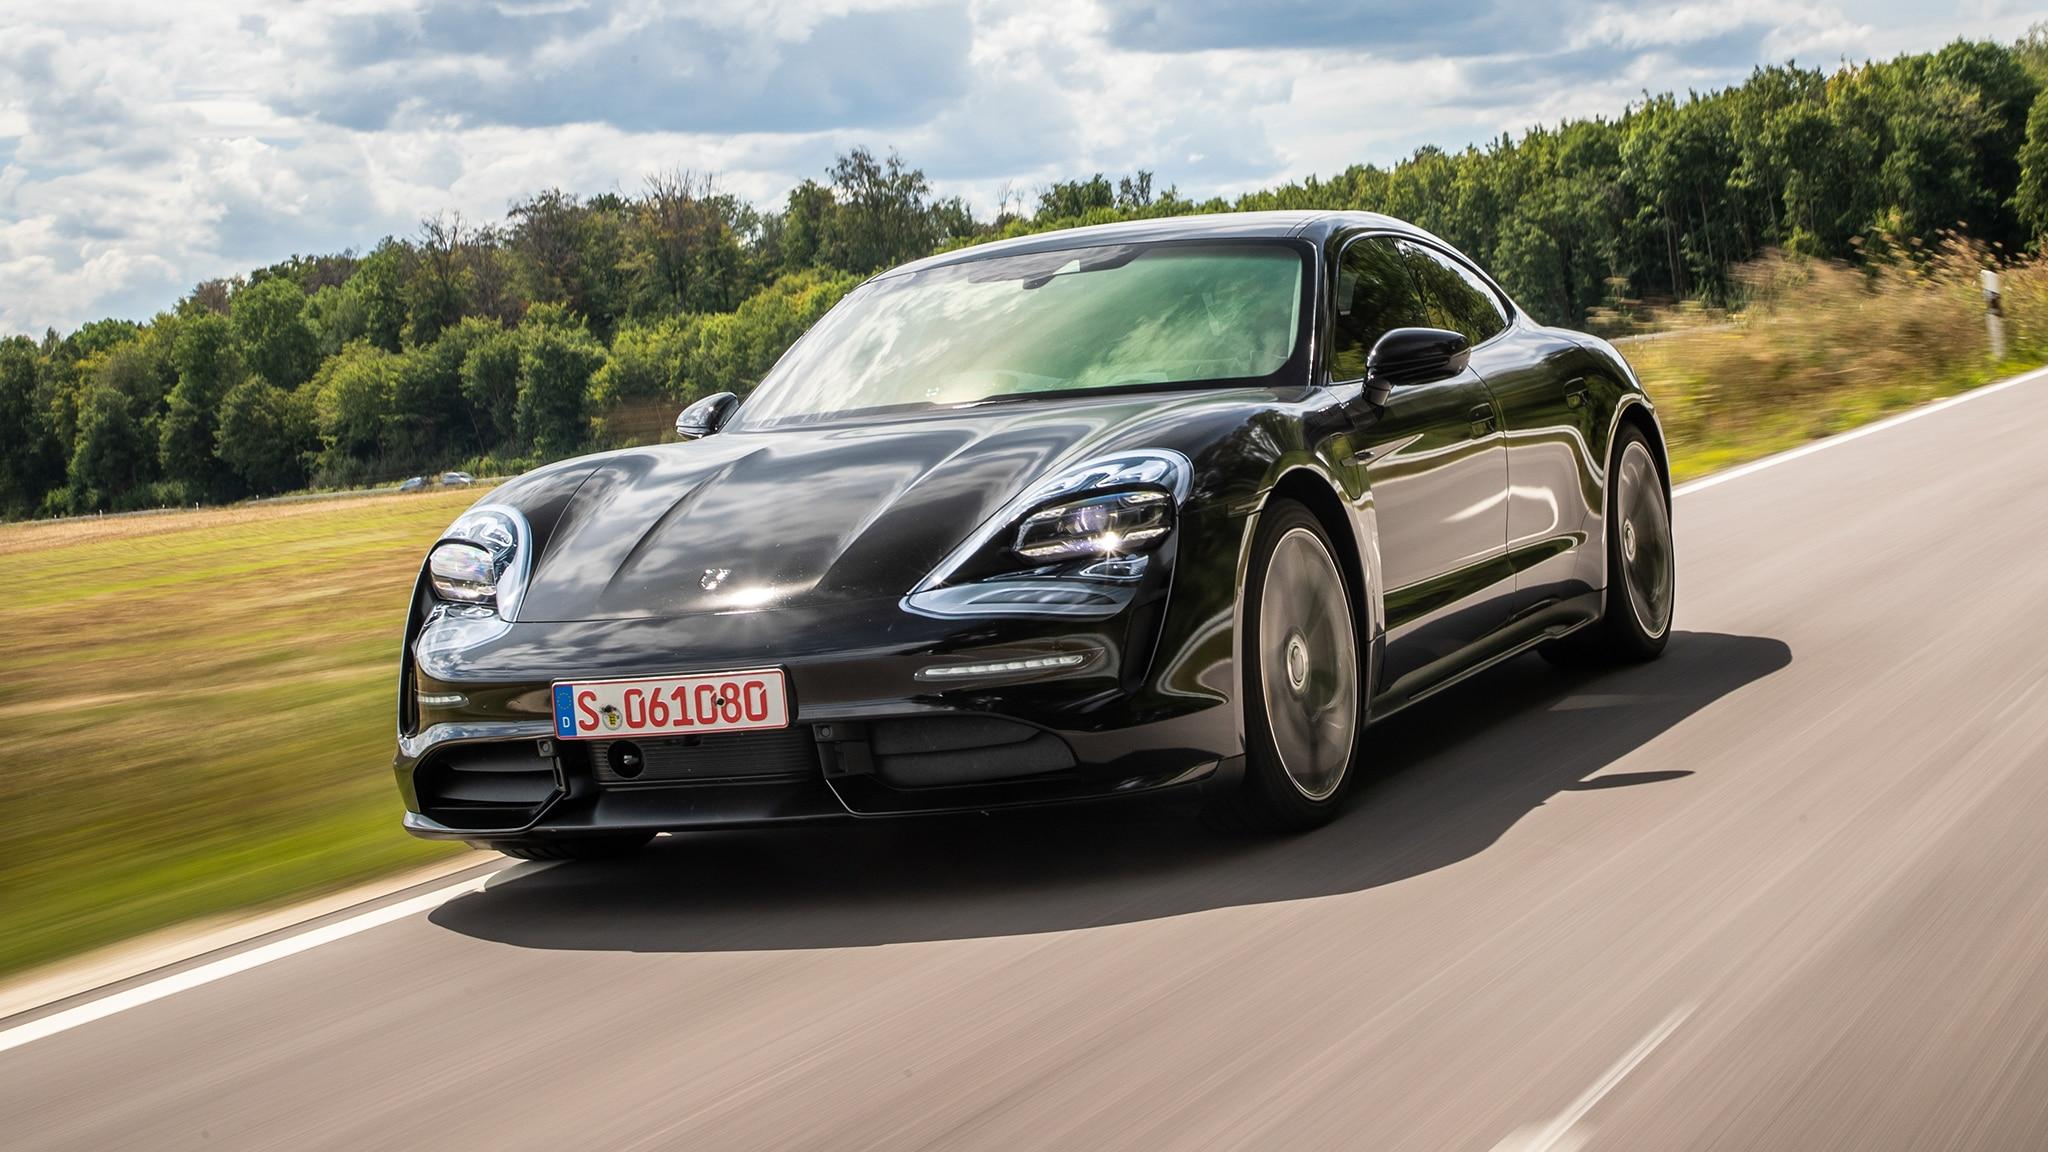 2020 Porsche Taycan Ev Review We Drive The Tesla Fighter